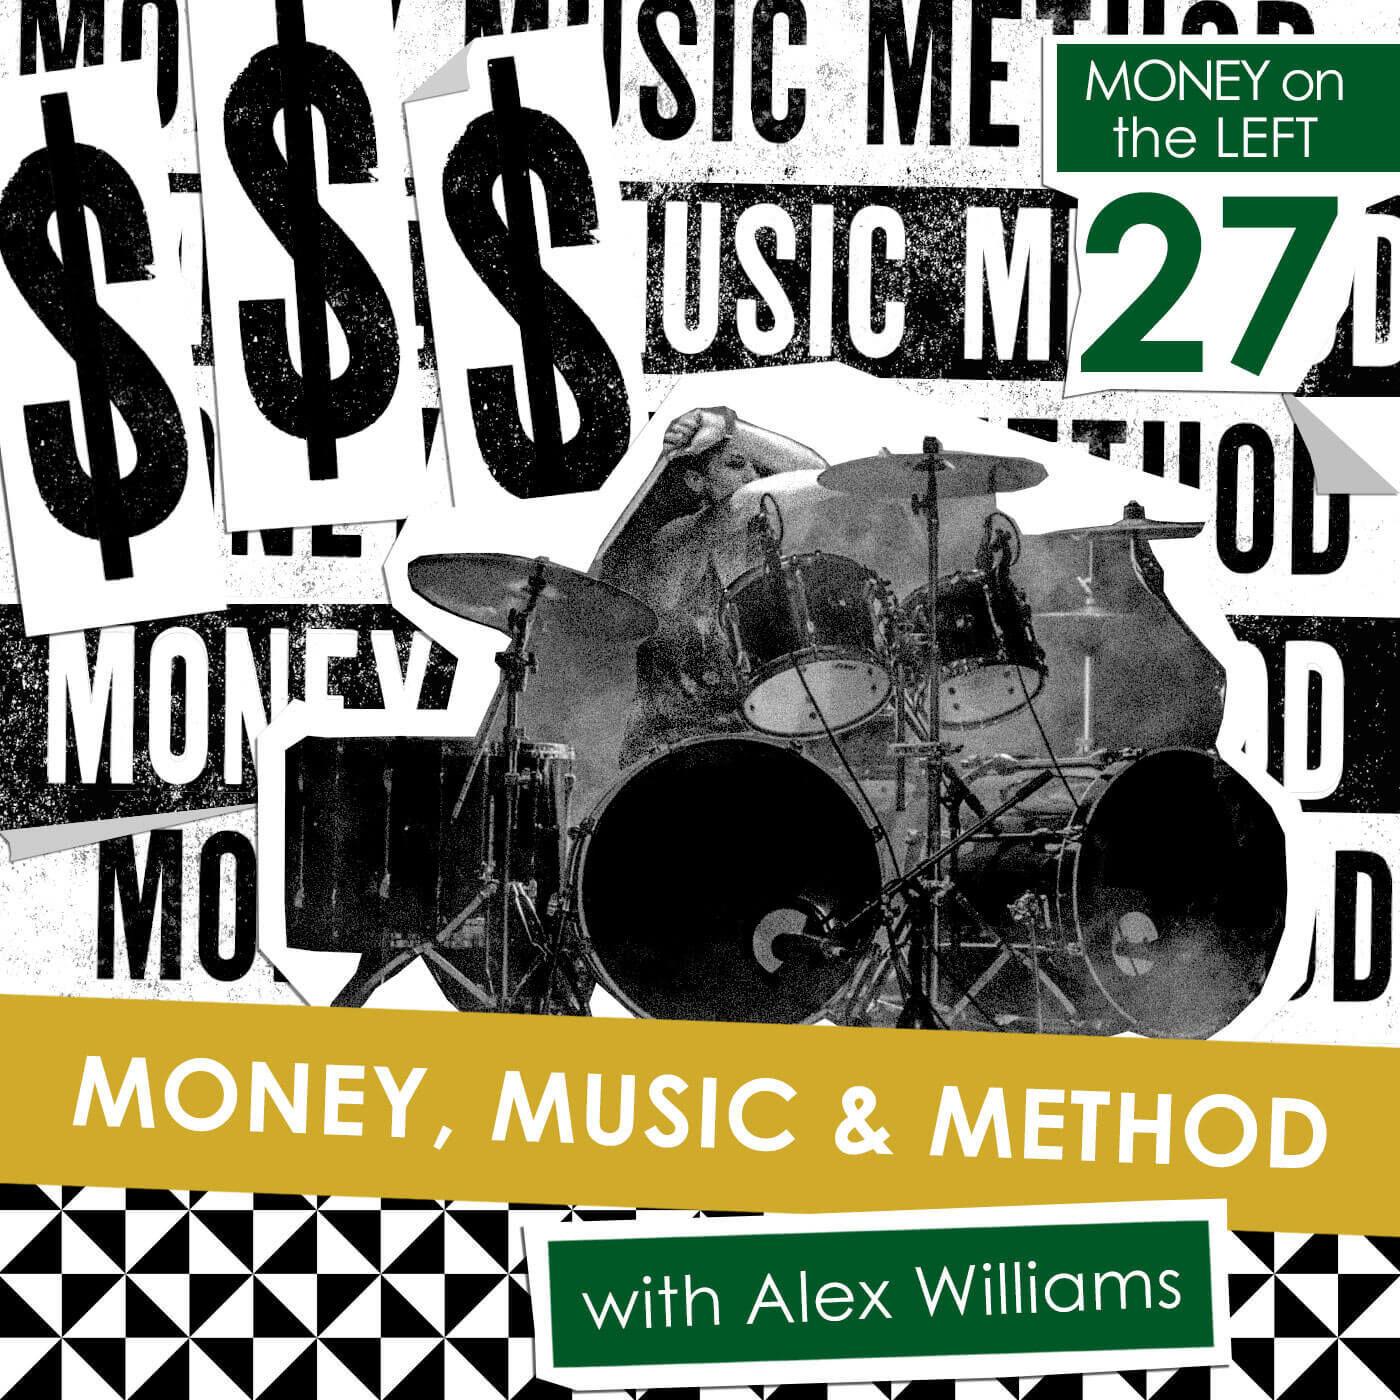 Money, Music & Method with Alex Williams